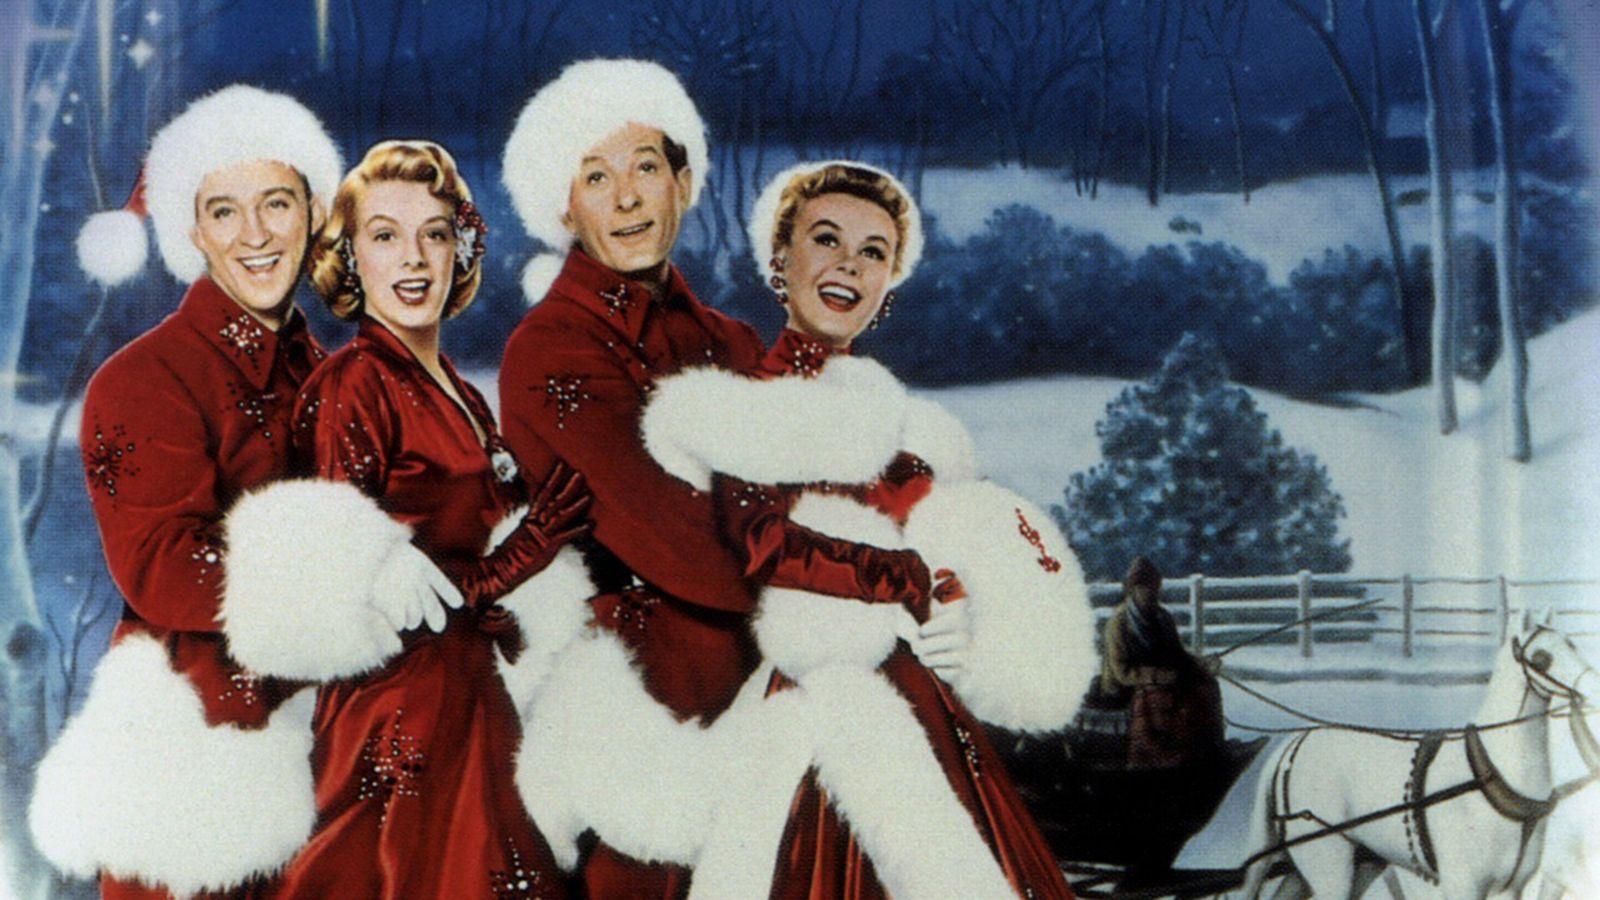 white christmas film white christmas re cert u white christmas movie castbest - White Christmas Movie Cast